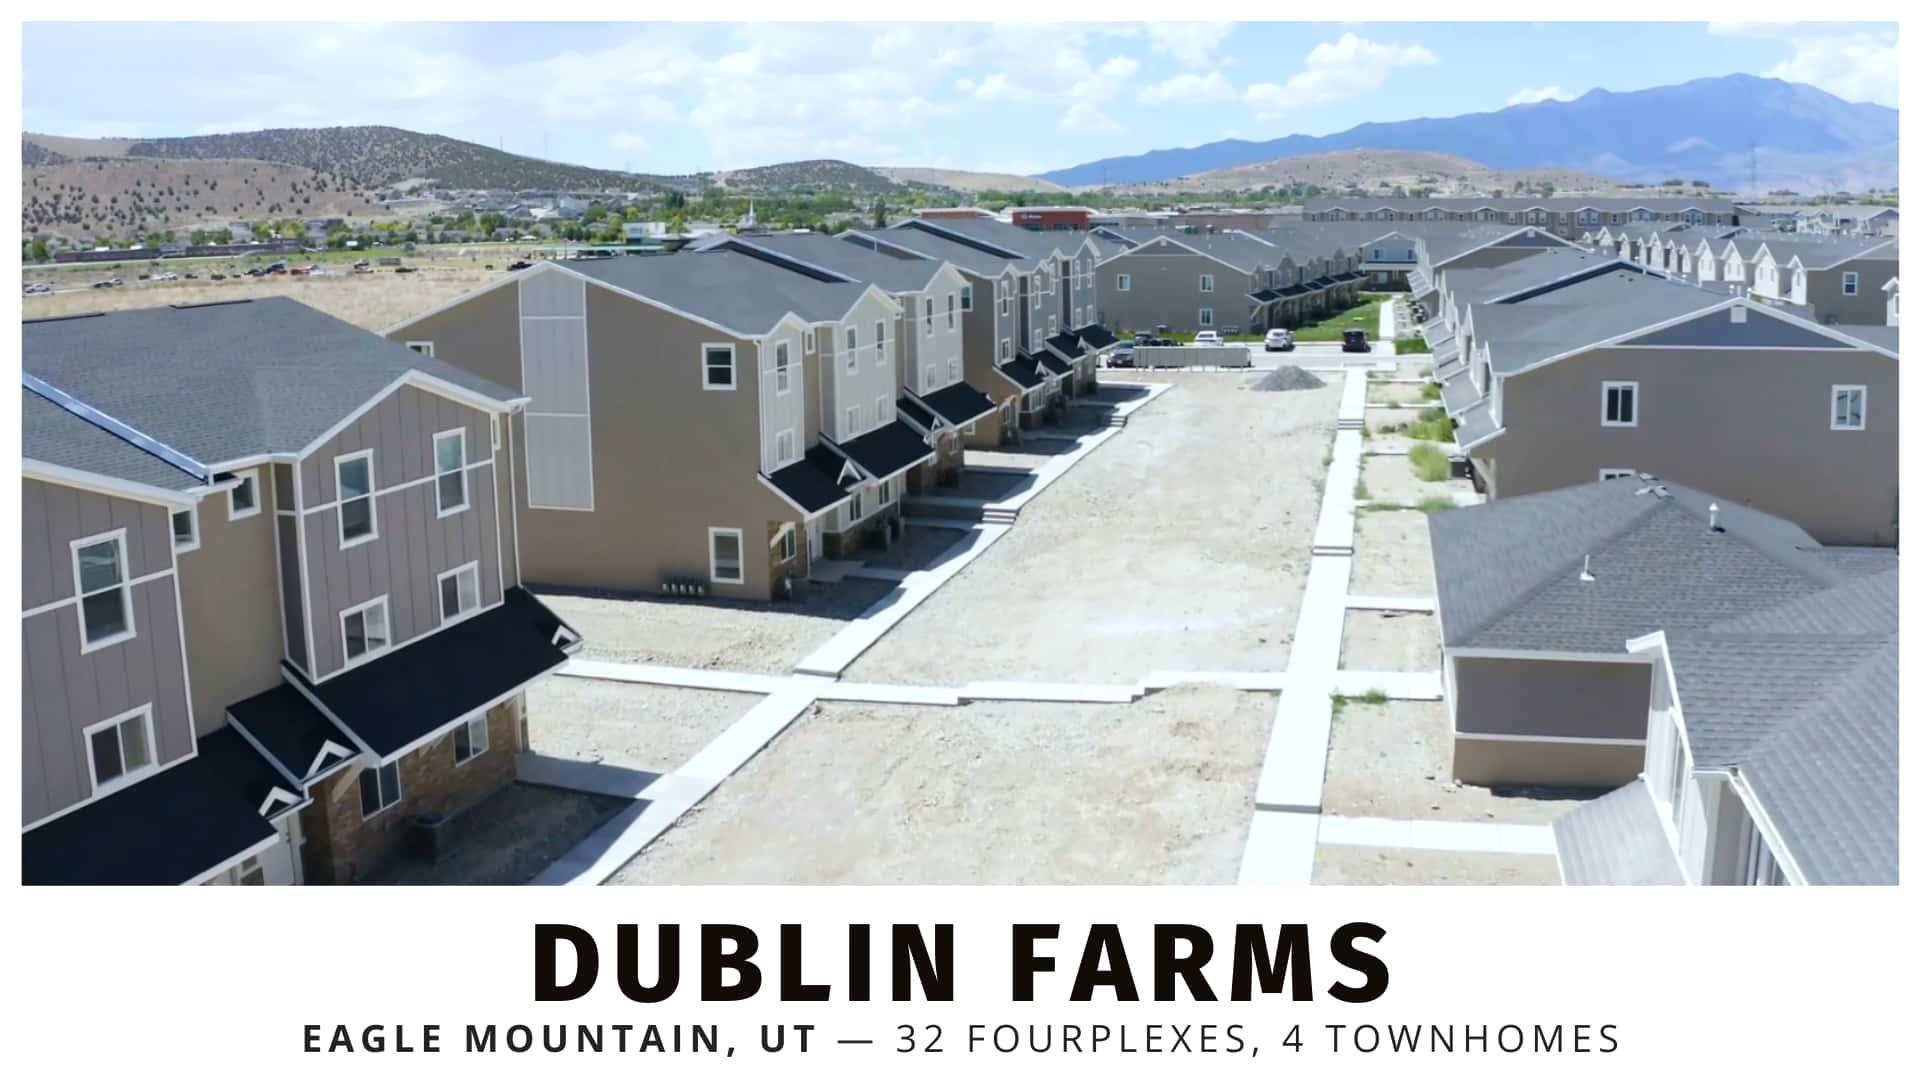 Dublin Farms Fourplexes for sale in Eagle Mountain, Utah